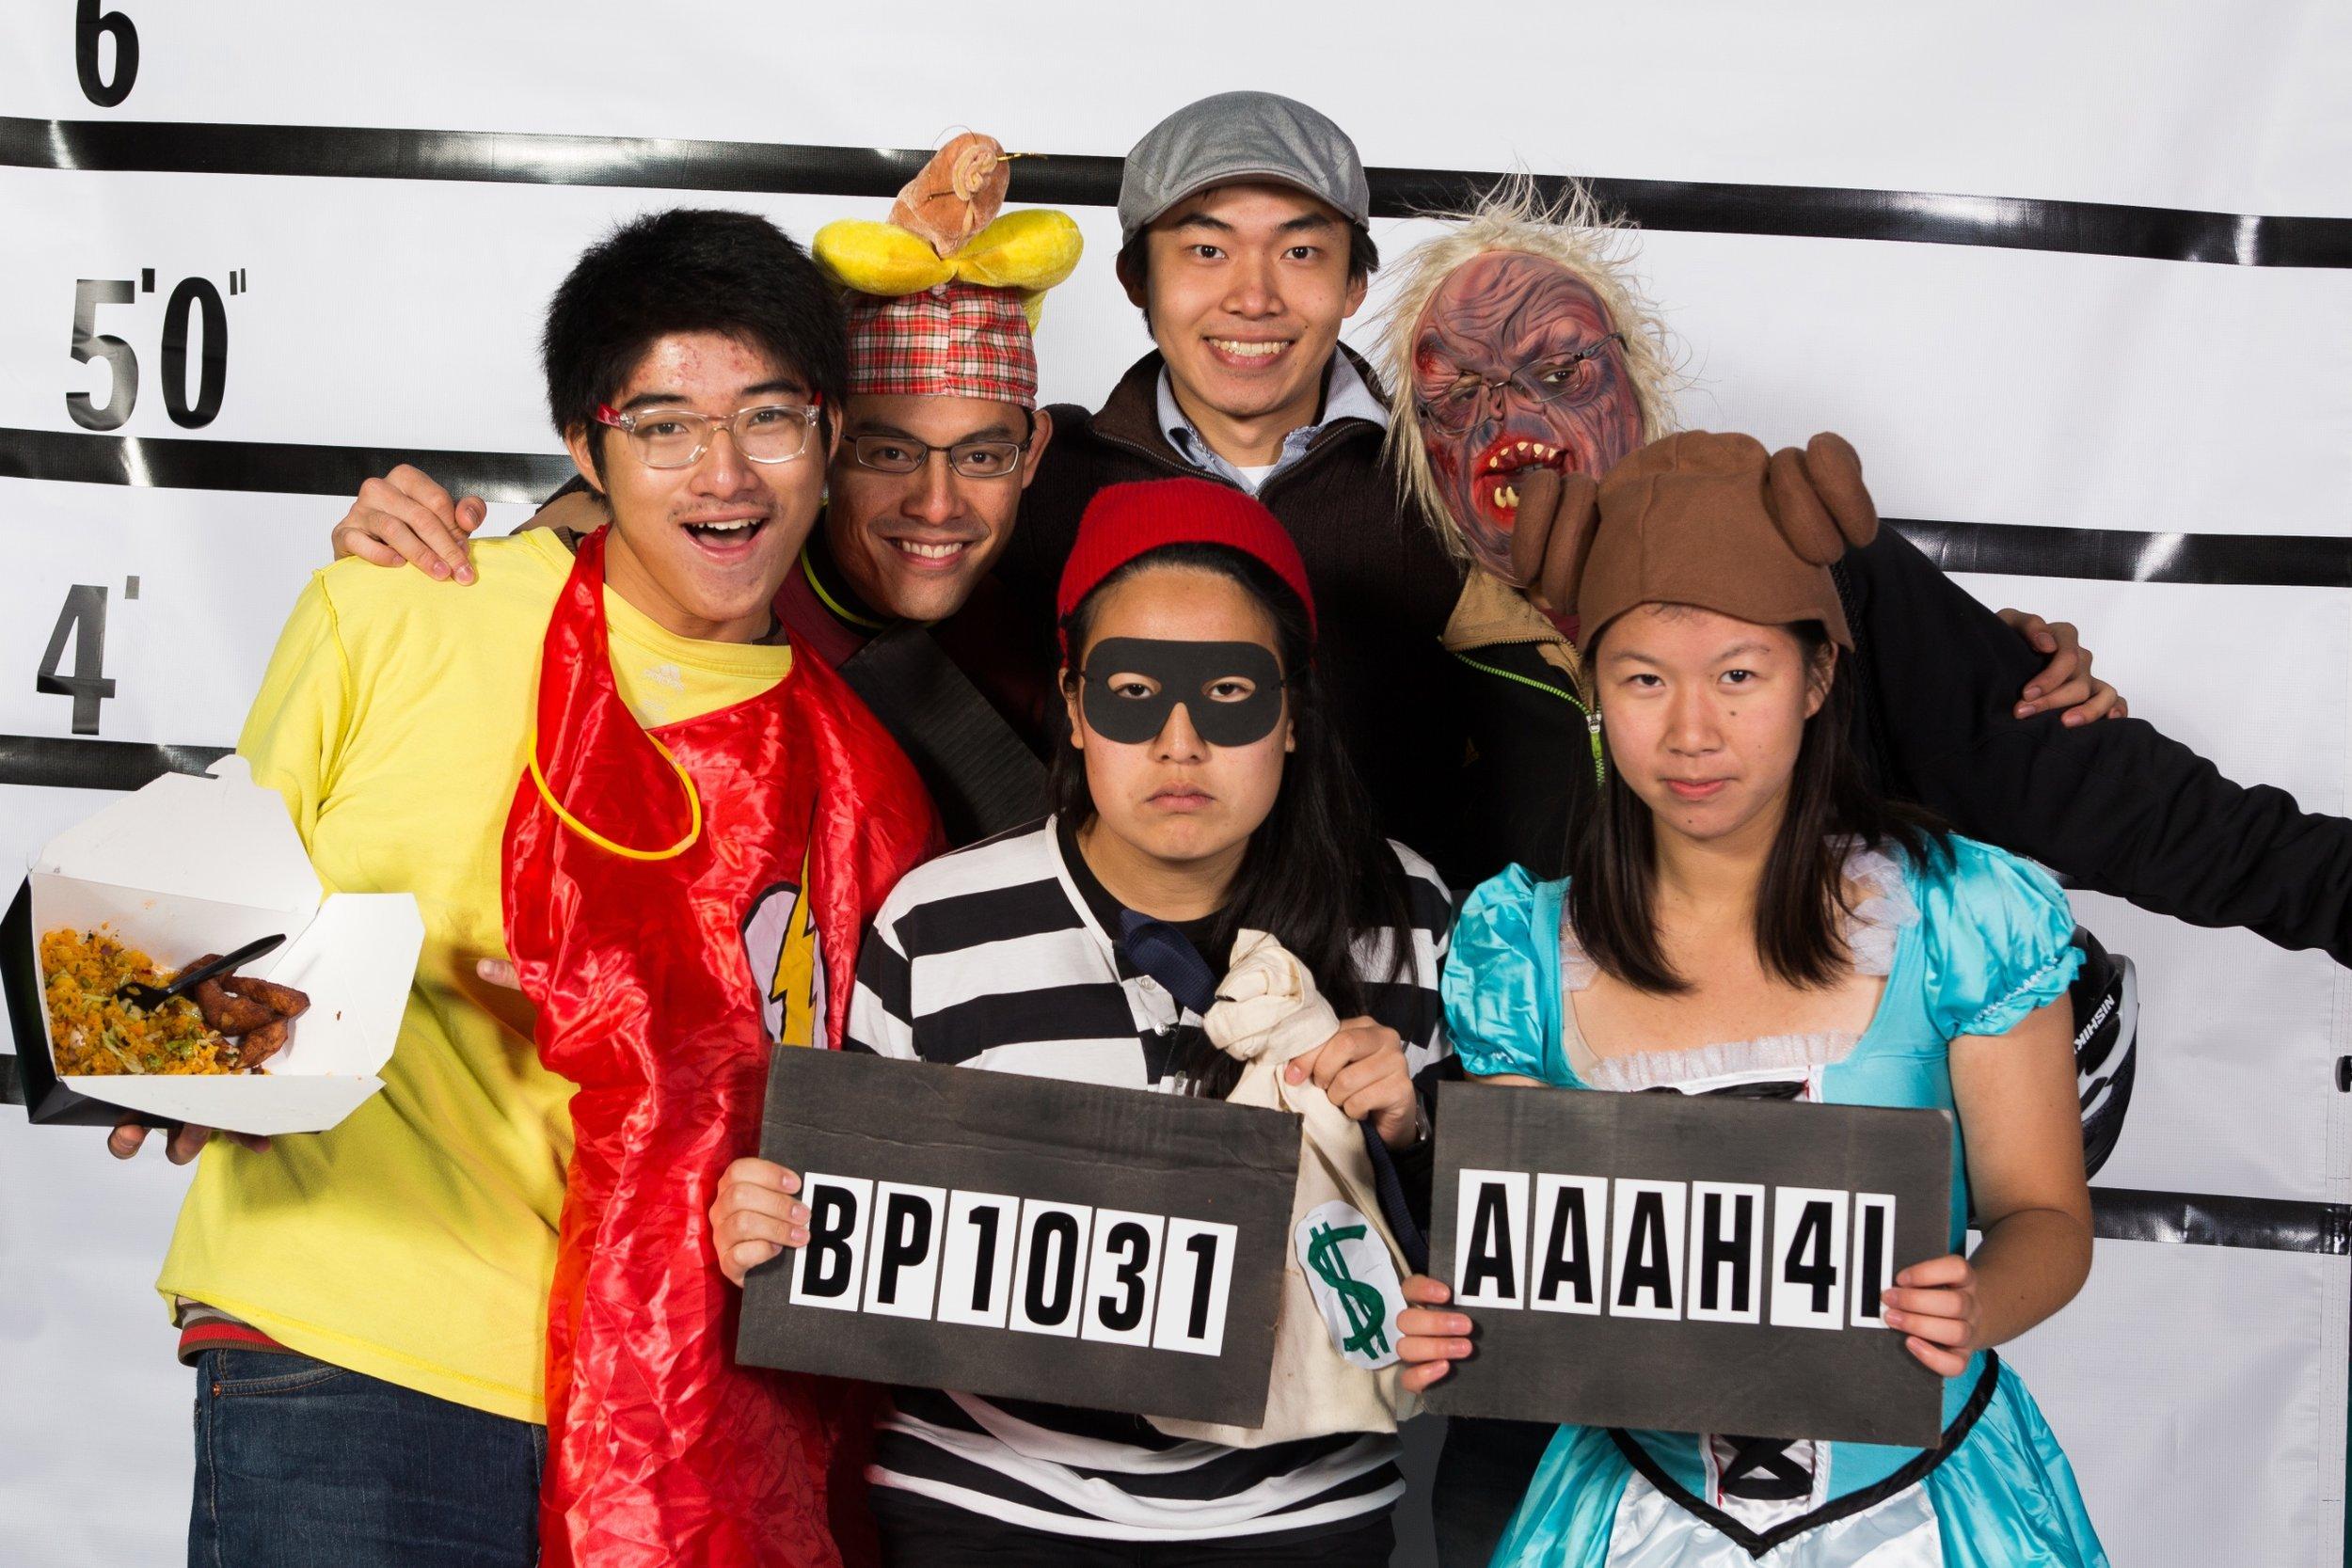 Group of people dressed as inmates